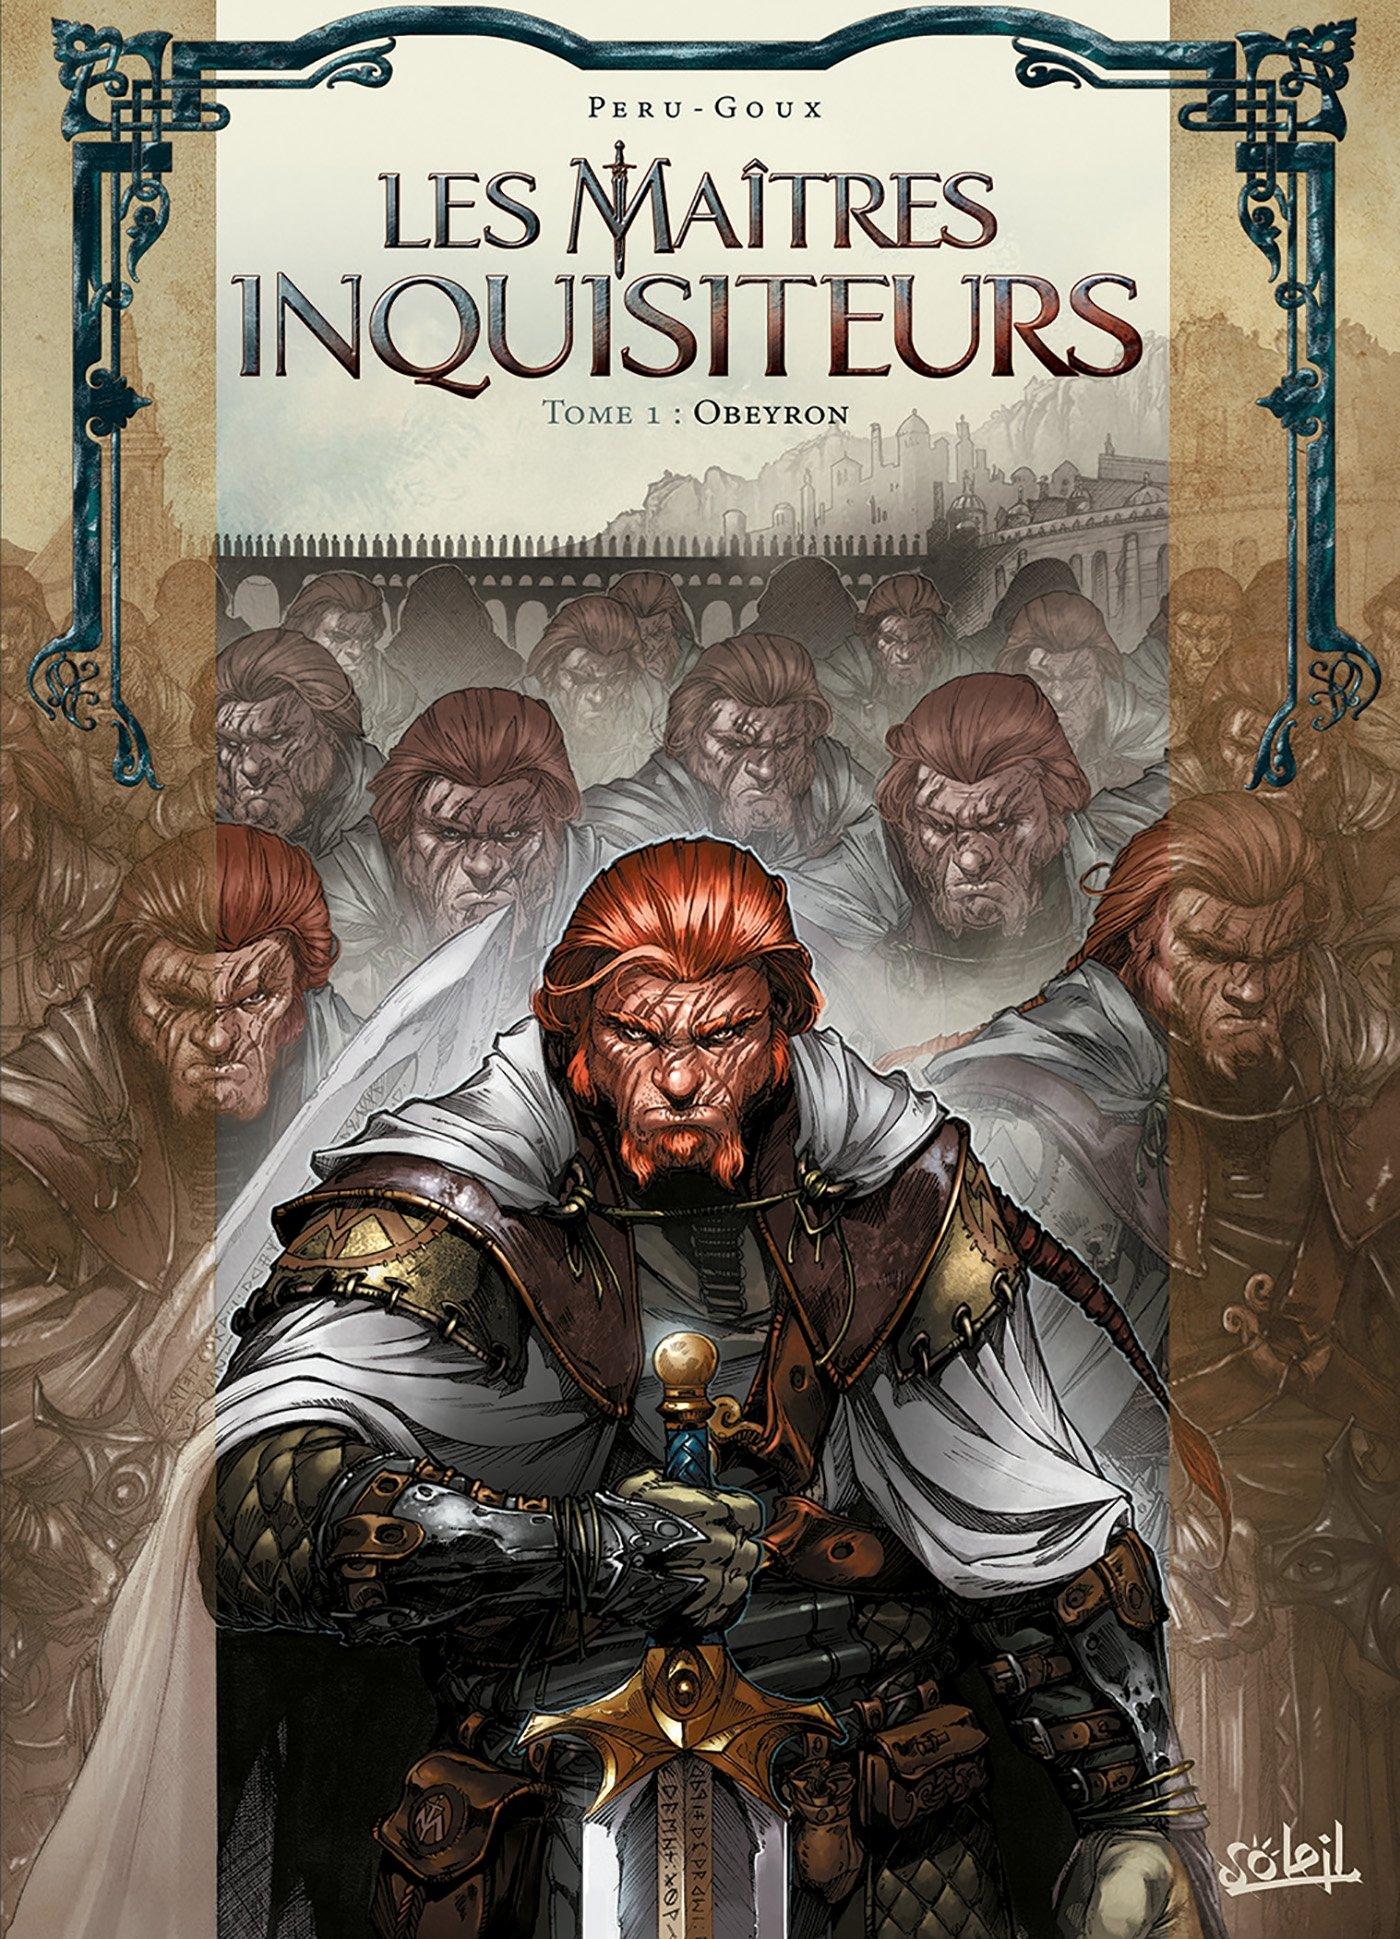 Amazon.fr - Les Maîtres inquisiteurs T01: Obeyron - PERU-O+GOUX-P+DELLAC-B  - Livres